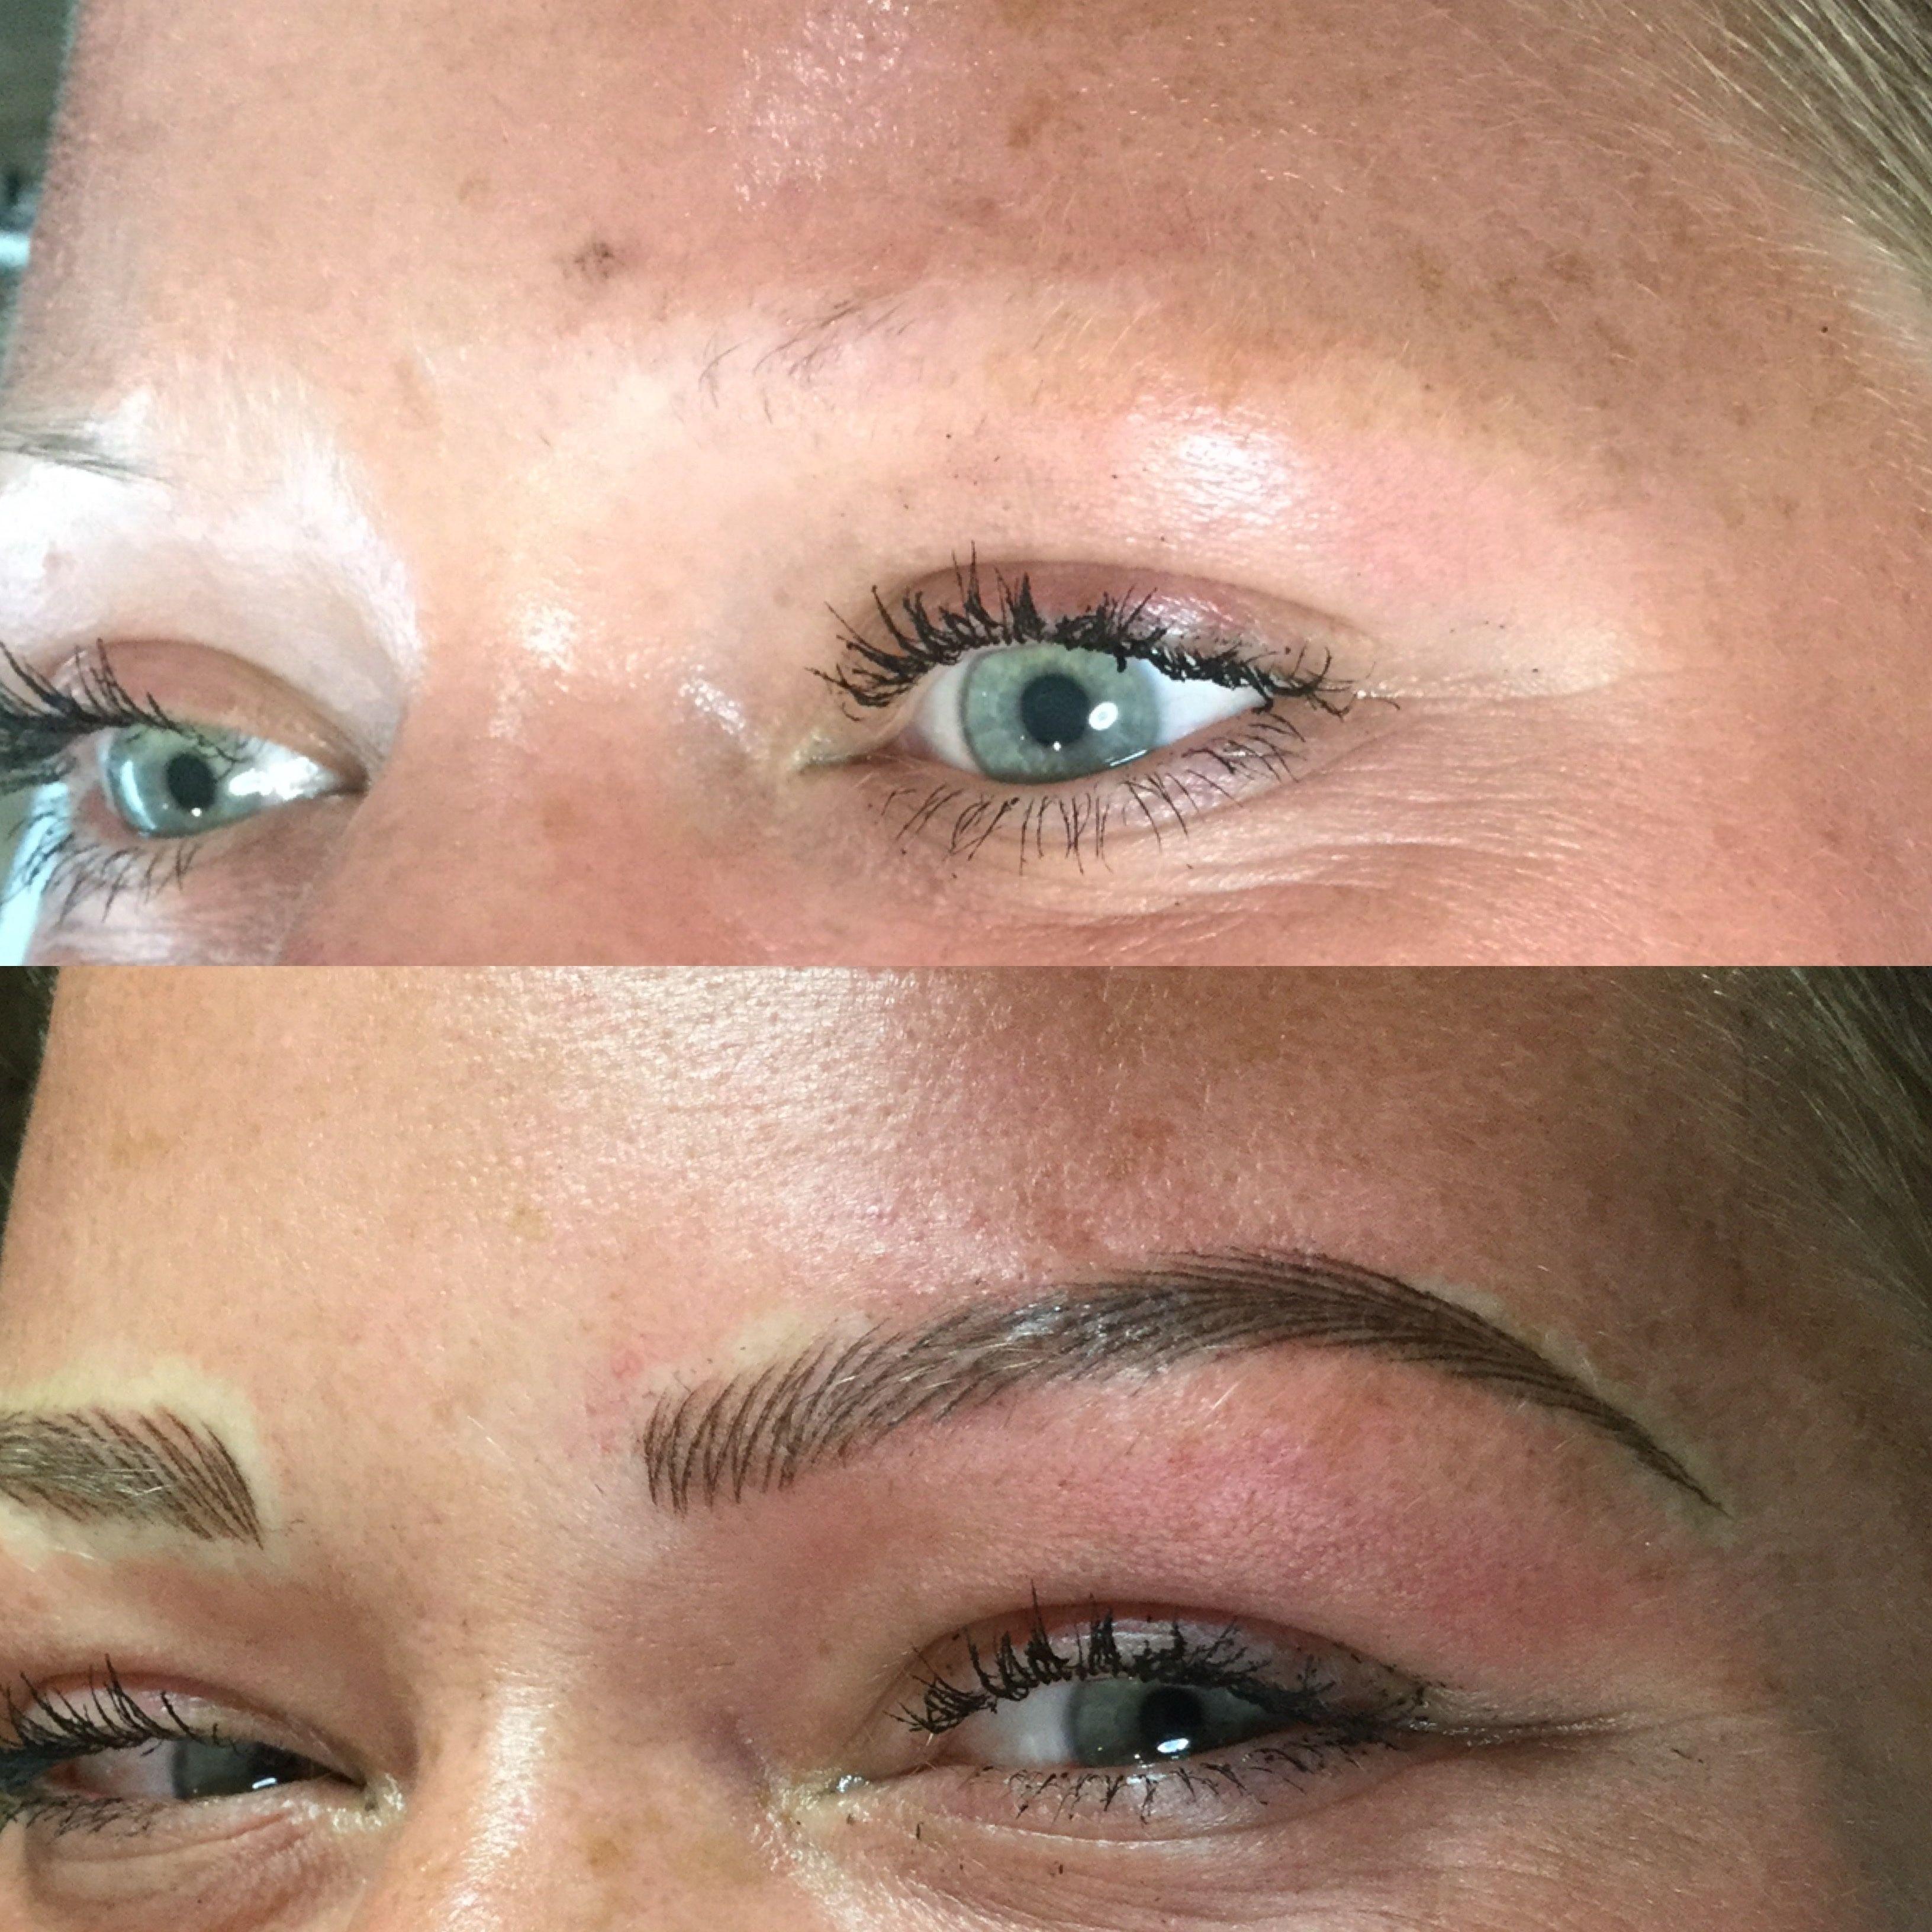 Micropigmentation Eyebrows By Mako Cosmetic Tattoo Arts